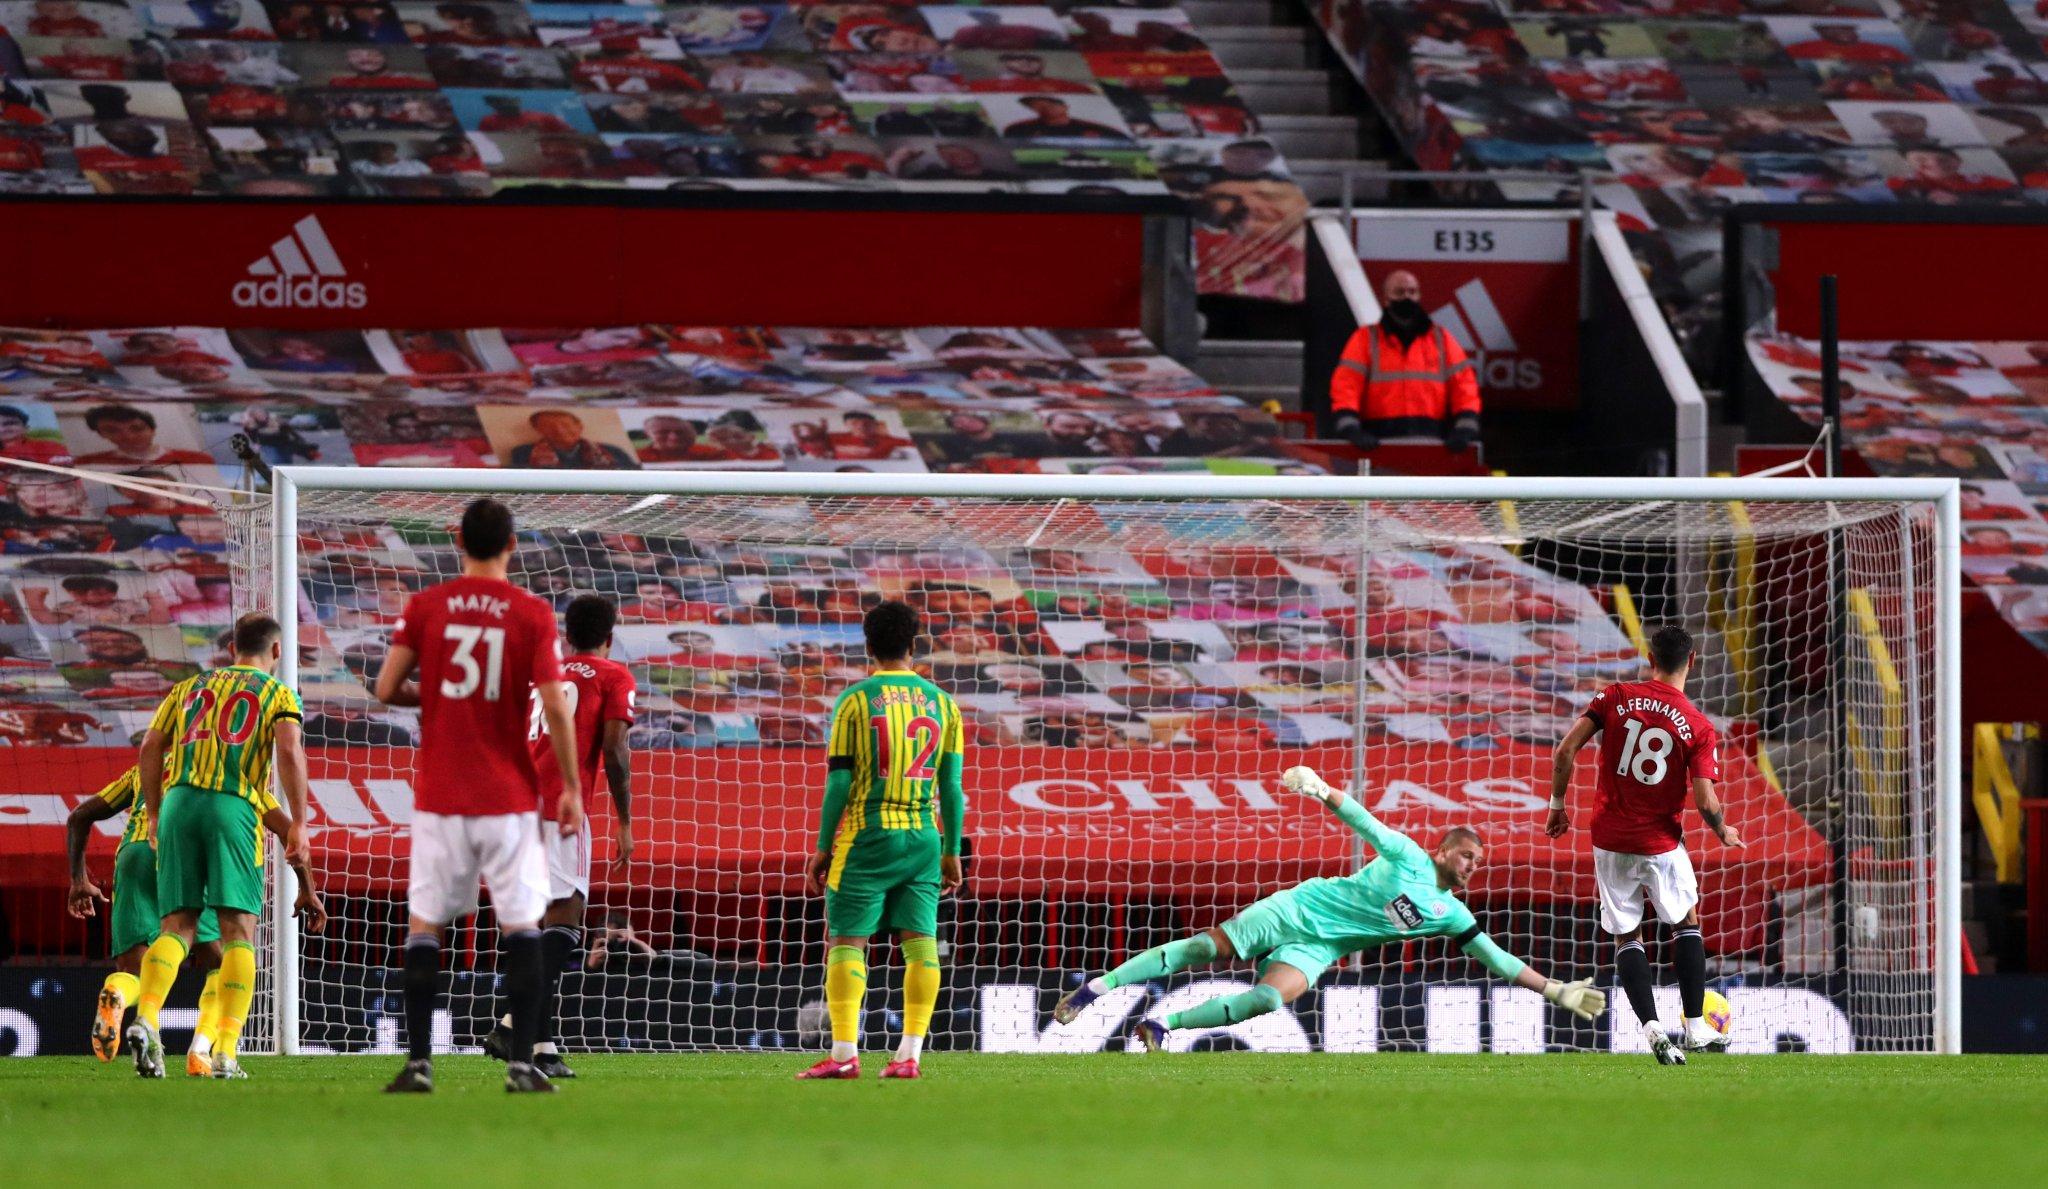 مان يونايتد ضد وست بروميتش (4)